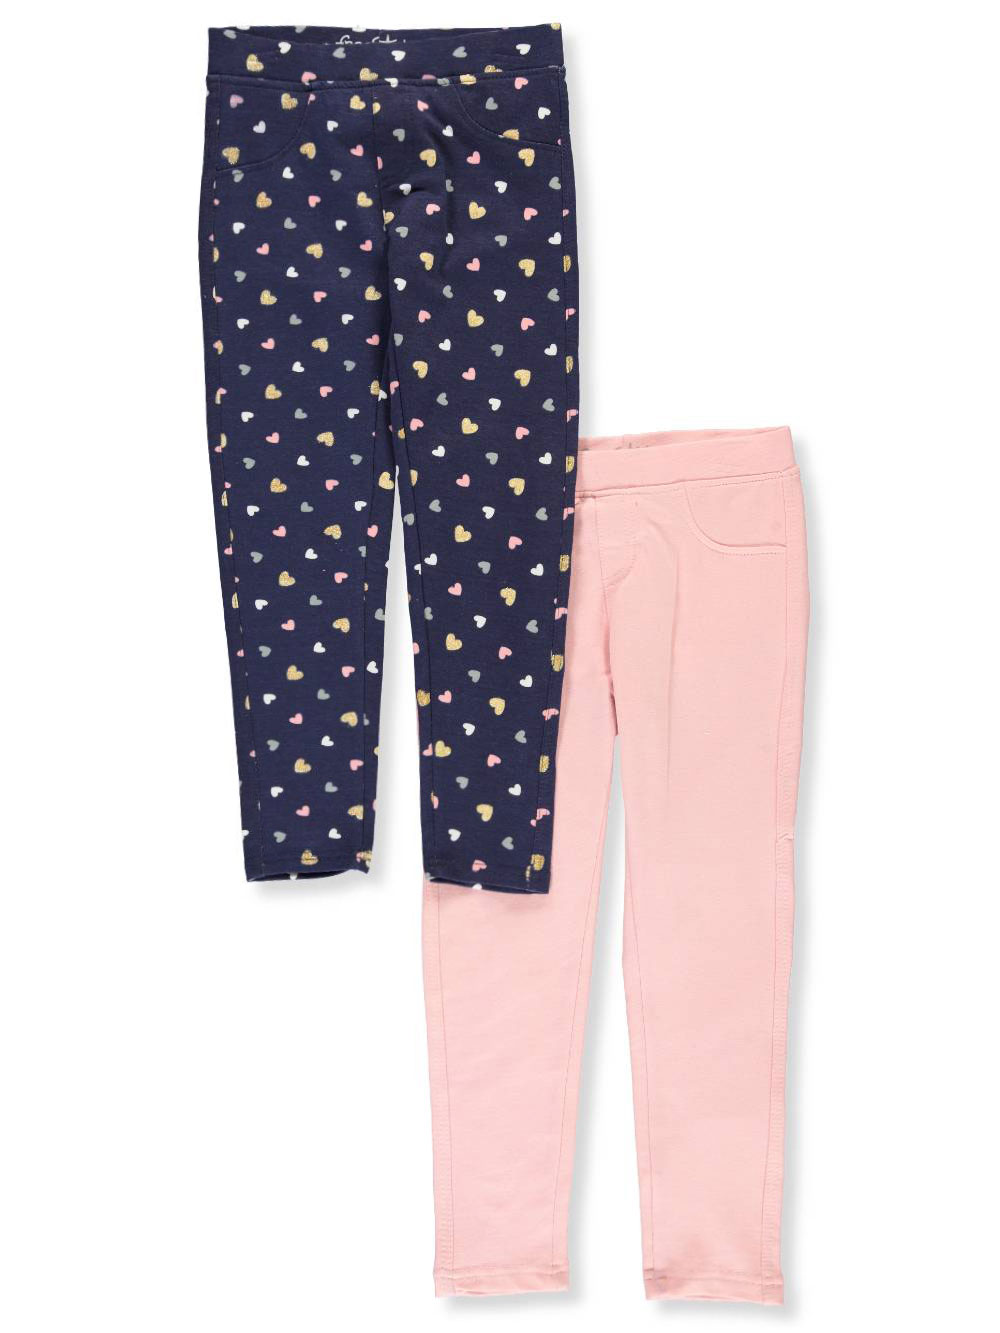 Freestyle Revolution Girls 2 Pack Pajama Bottoms